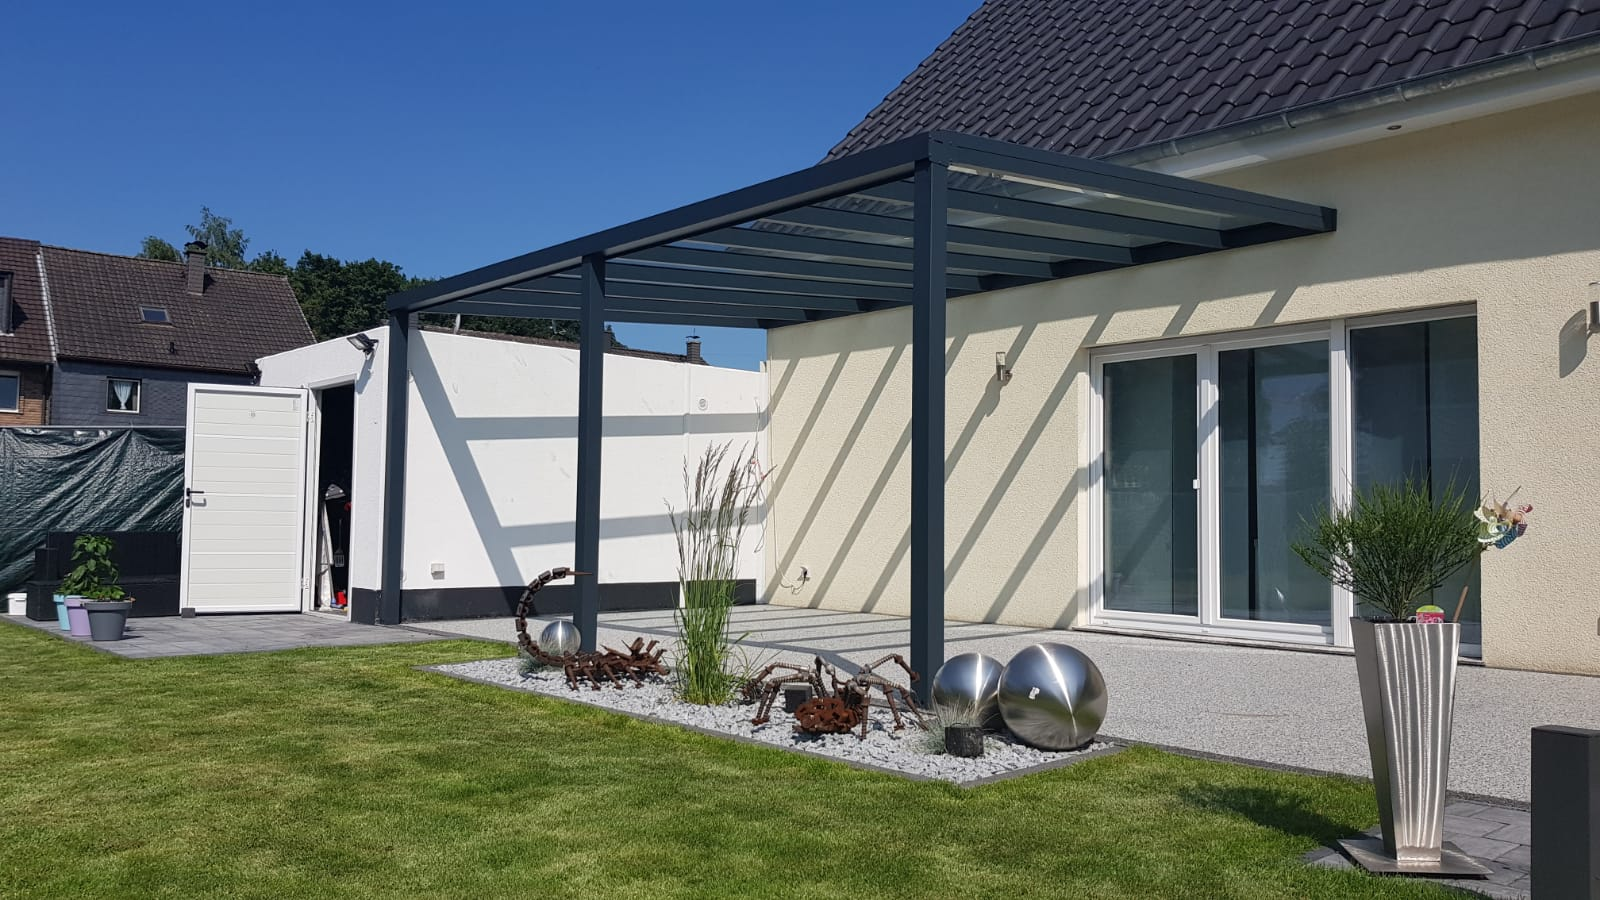 terrassen berdachung terrassendach und terrassen berdachung alu. Black Bedroom Furniture Sets. Home Design Ideas